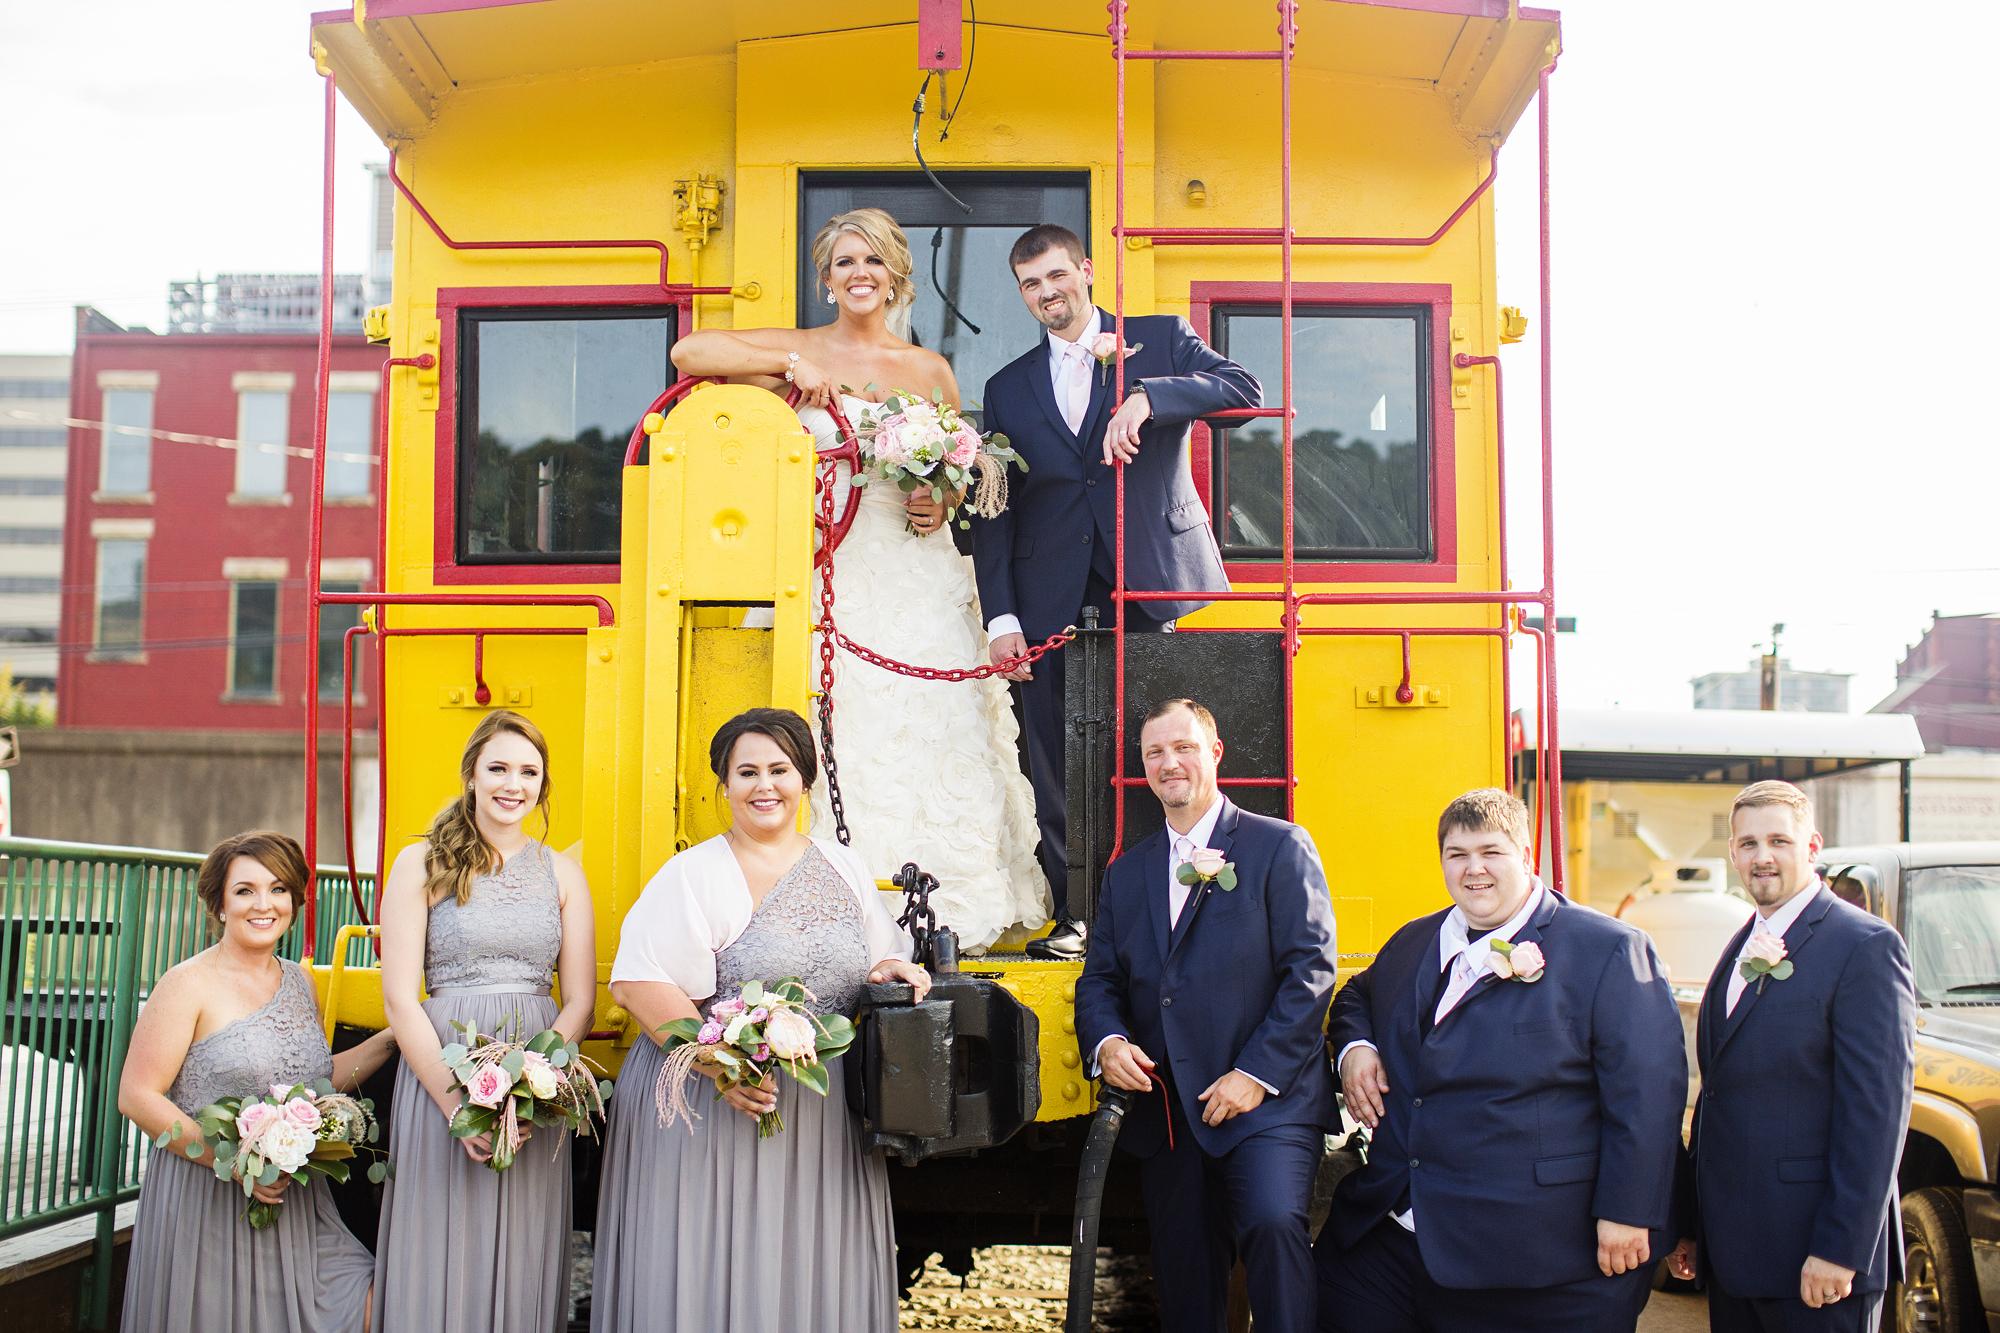 Seriously_Sabrina_Photography_Ashland_Kentucky_Train_Depot_Wedding_Parsons52.jpg